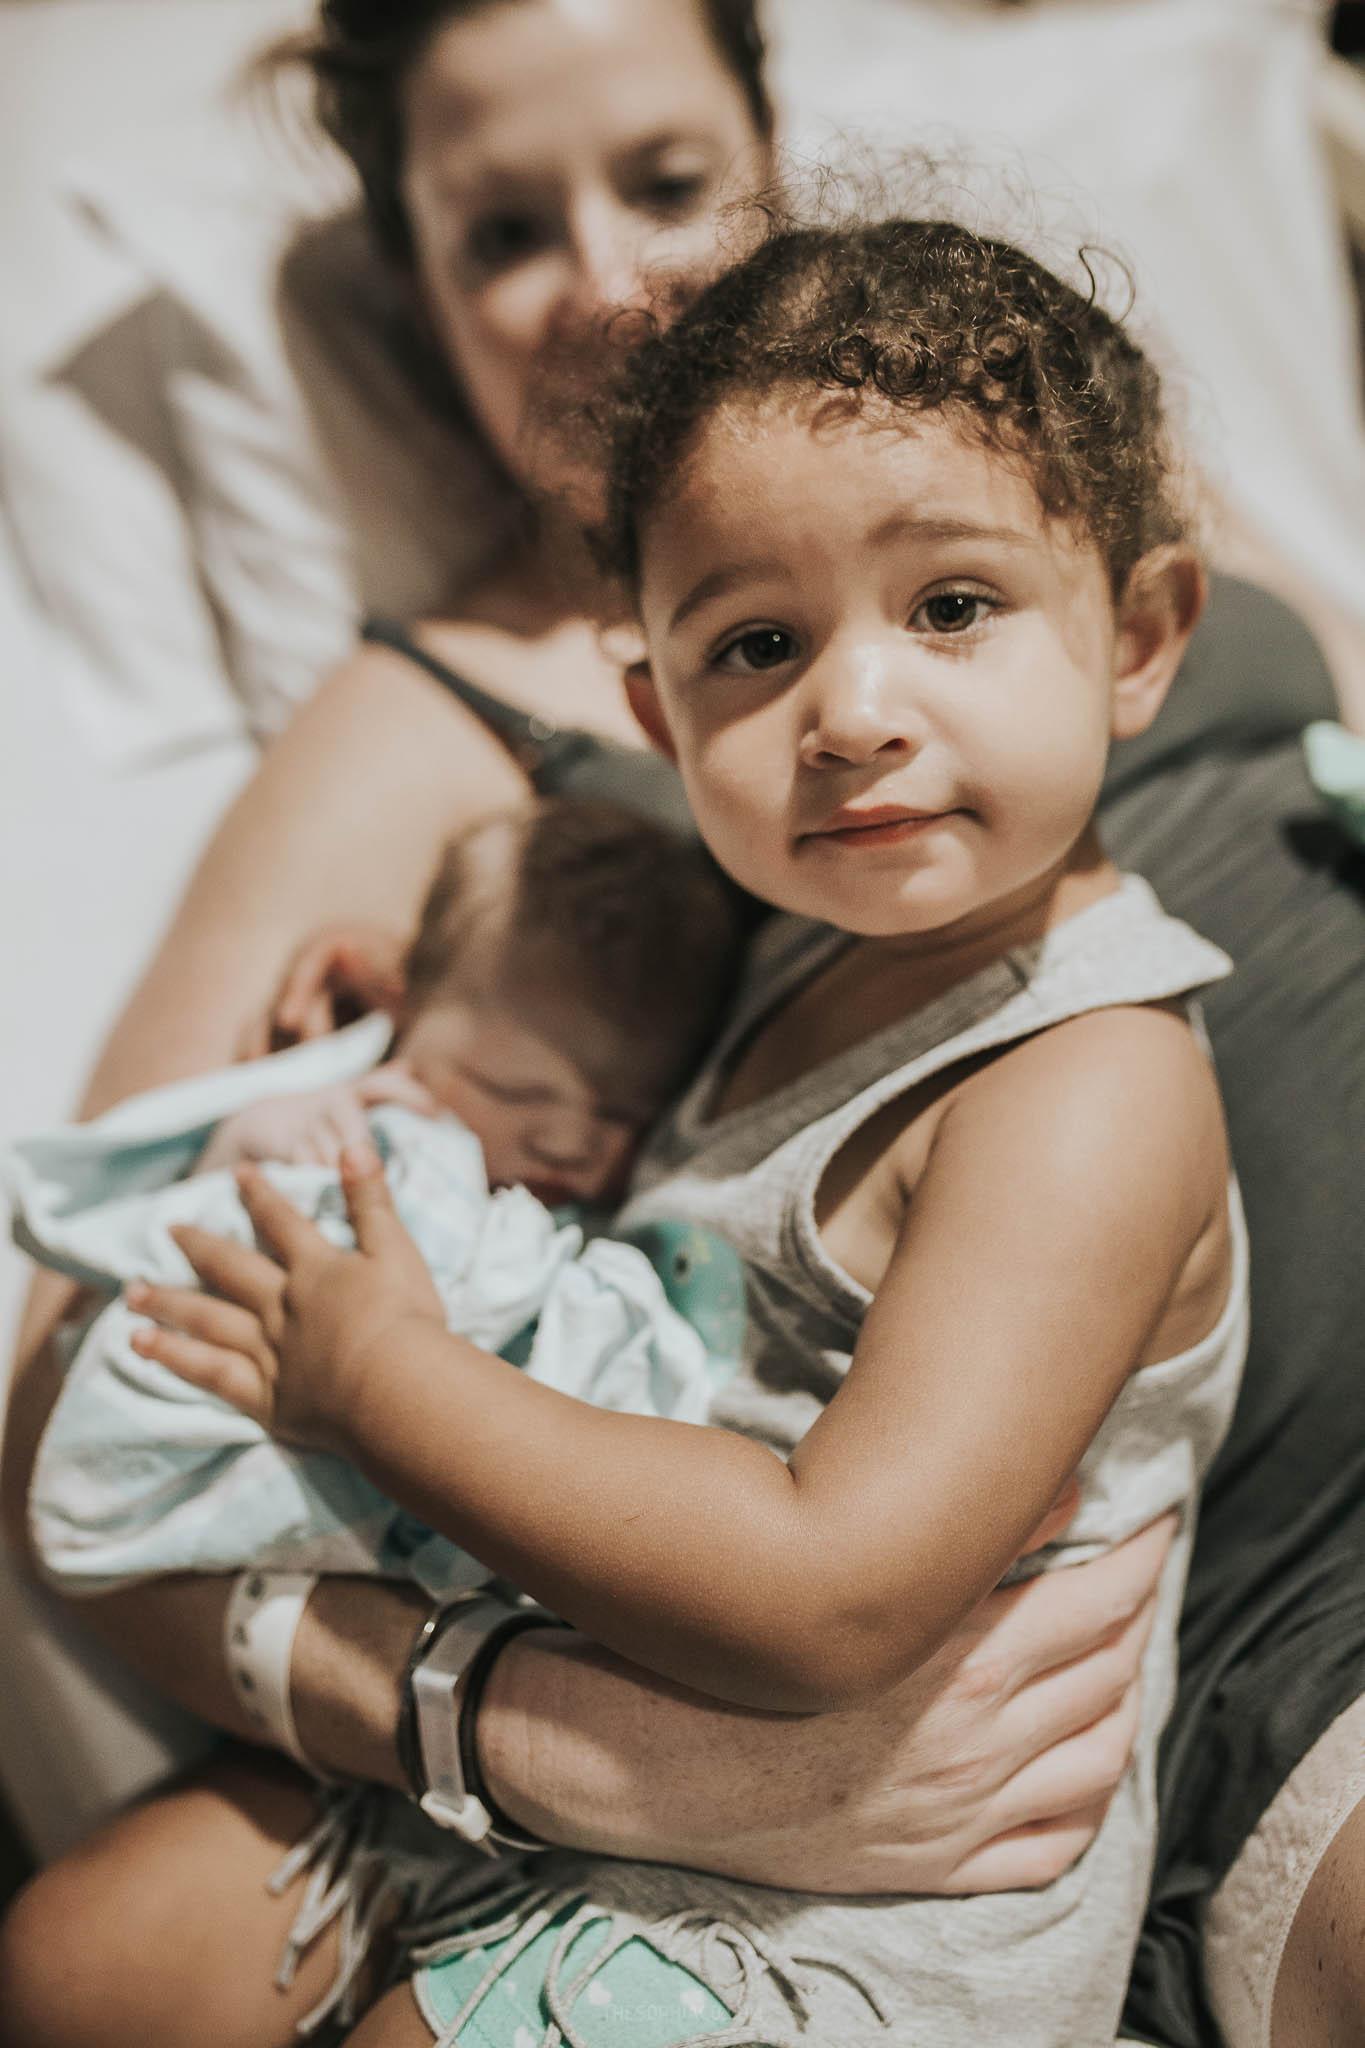 oahu-birth-photography-33.jpg